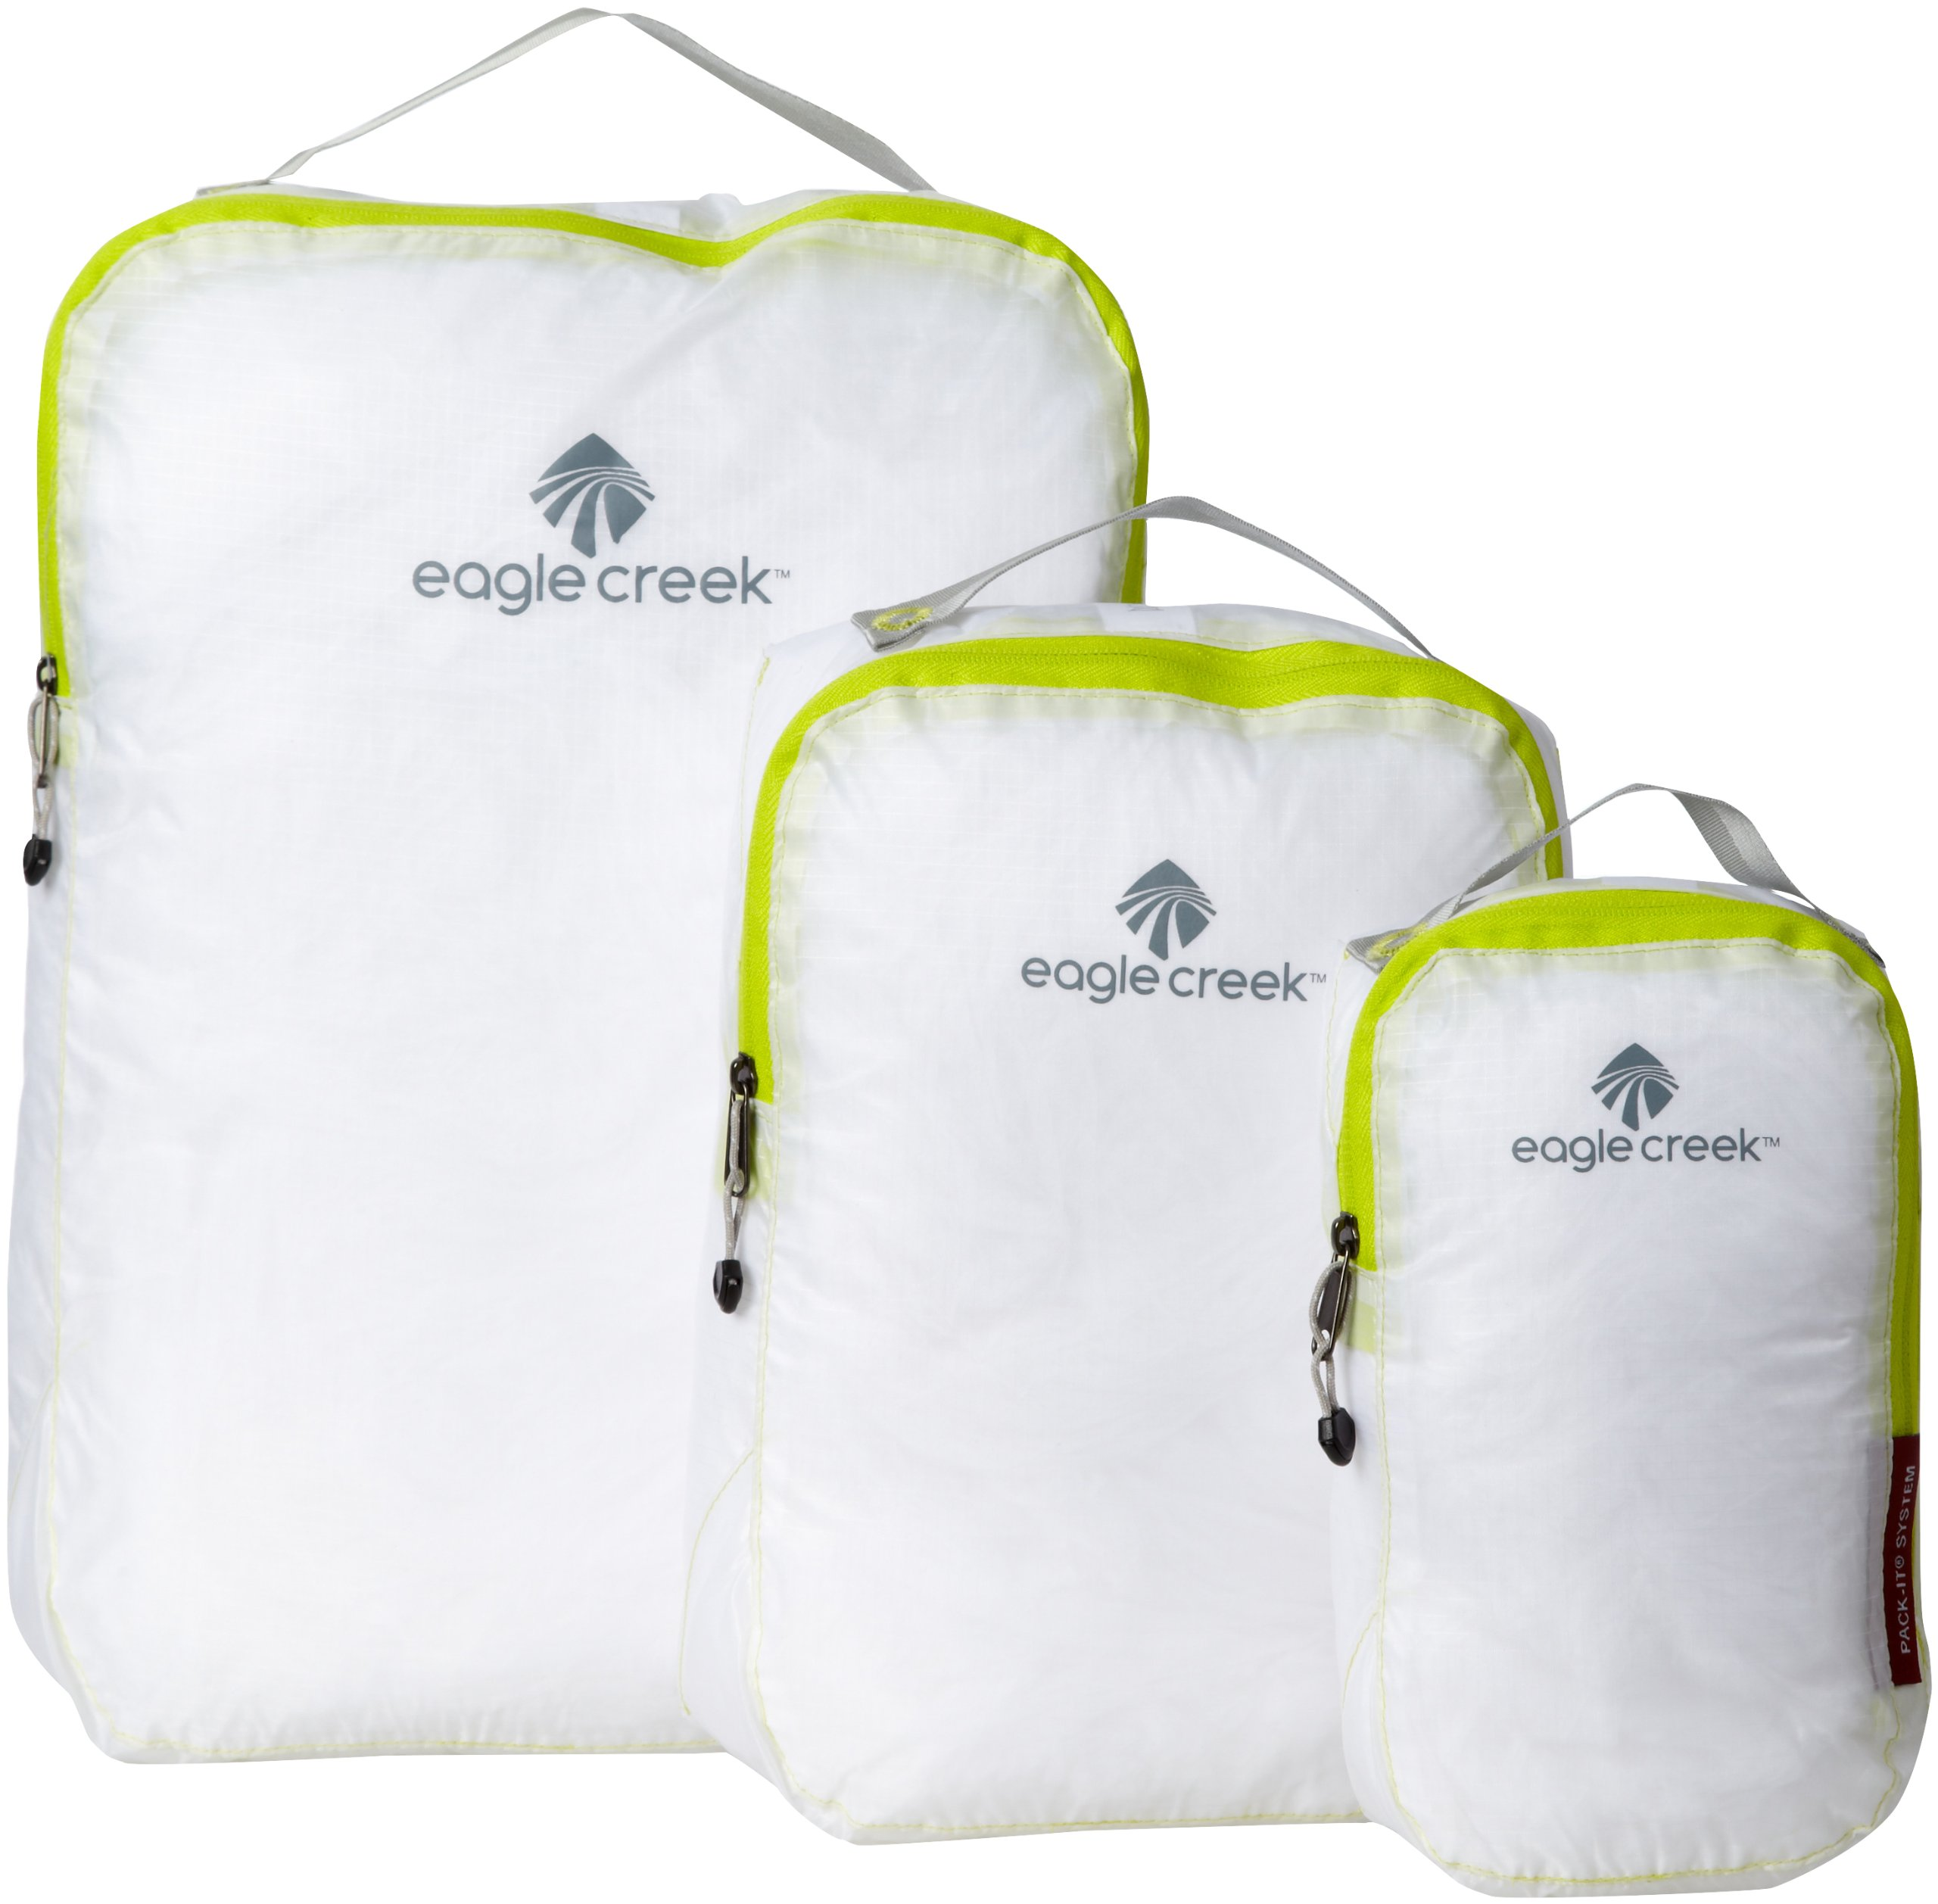 Eagle Creek Travel Gear Luggage Pack-it Specter Cube Set, White/Strobe